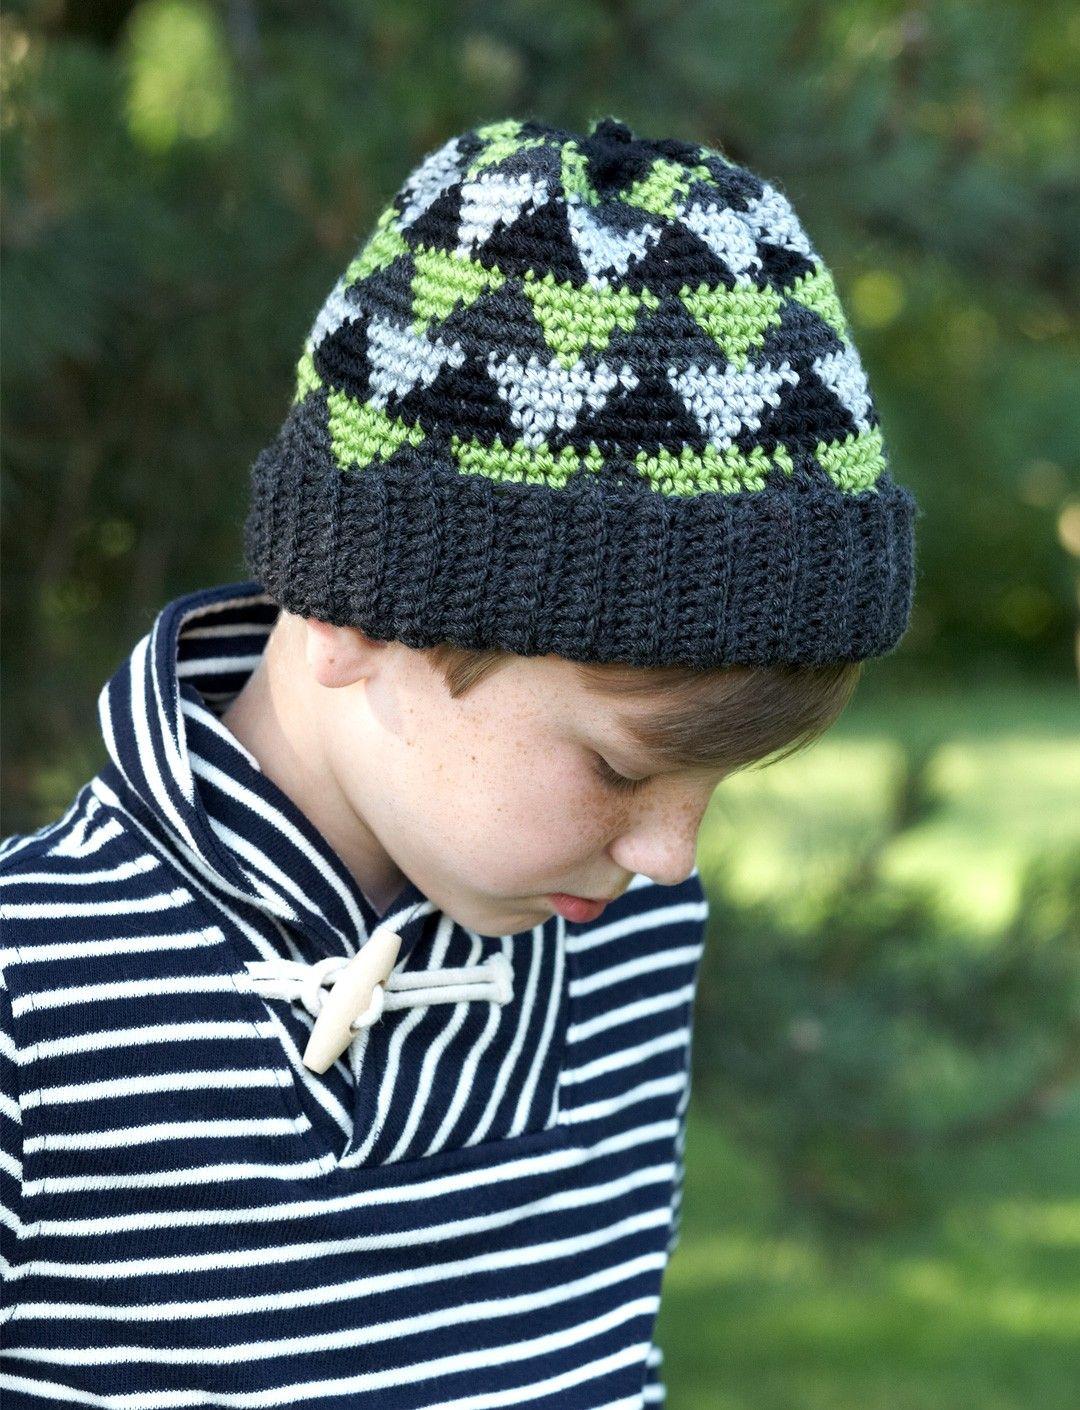 bd73ac4efcc Yarnspirations.com - Patons Canadiana - Navajo Kid s Hat (crochet) -  Patterns